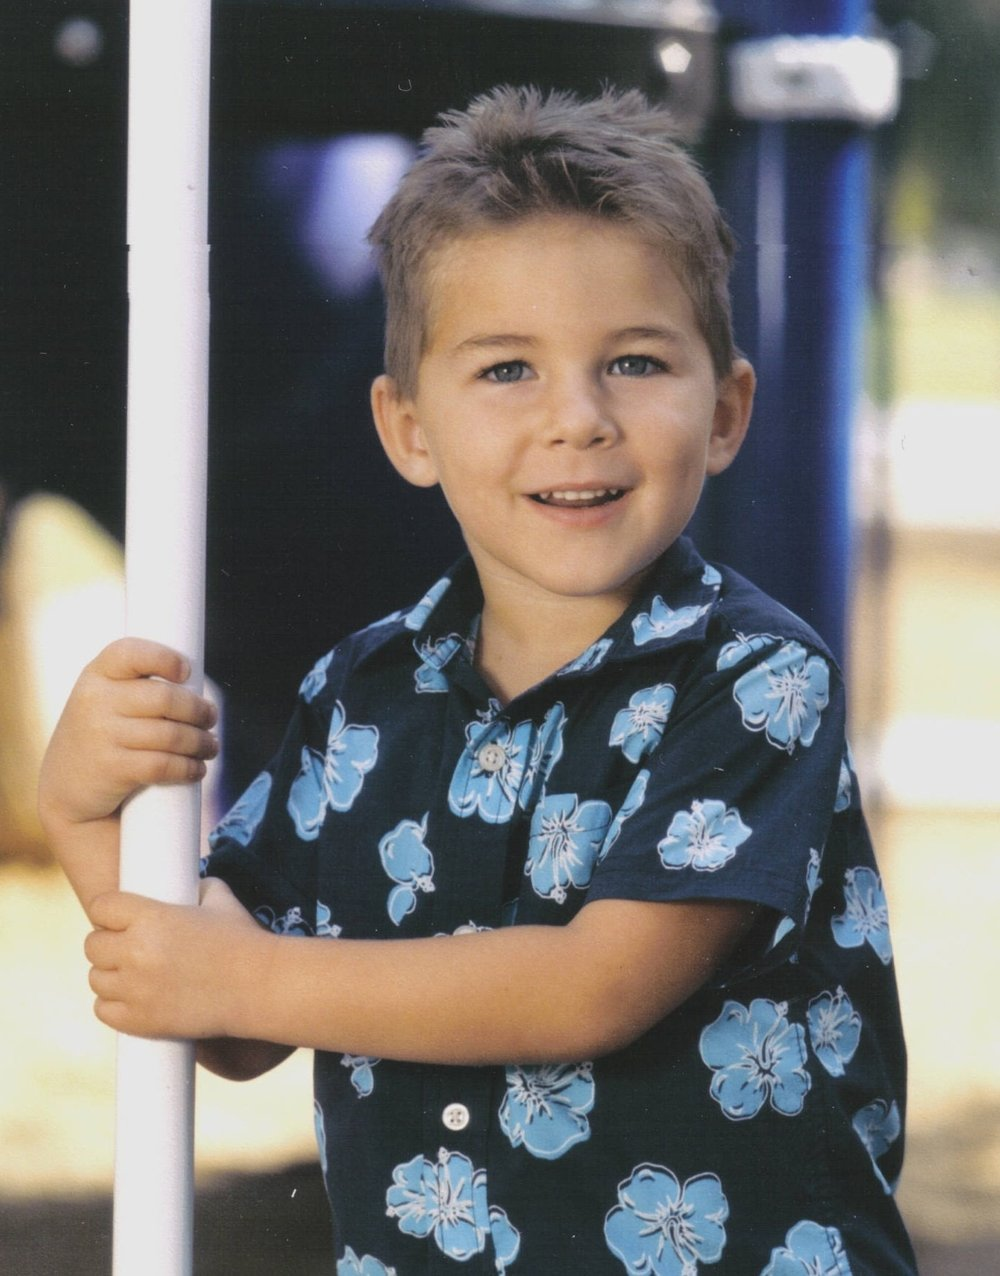 little boy with diabetes